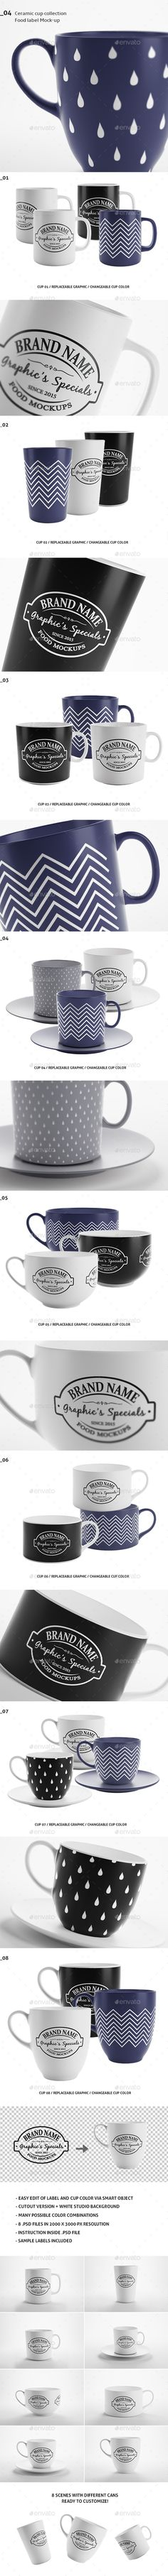 Mug/Cup Mockups — Photoshop PSD #Mocku up #collection • Available here → https://graphicriver.net/item/mug-and-cup-mockups/18837304?ref=pxcr